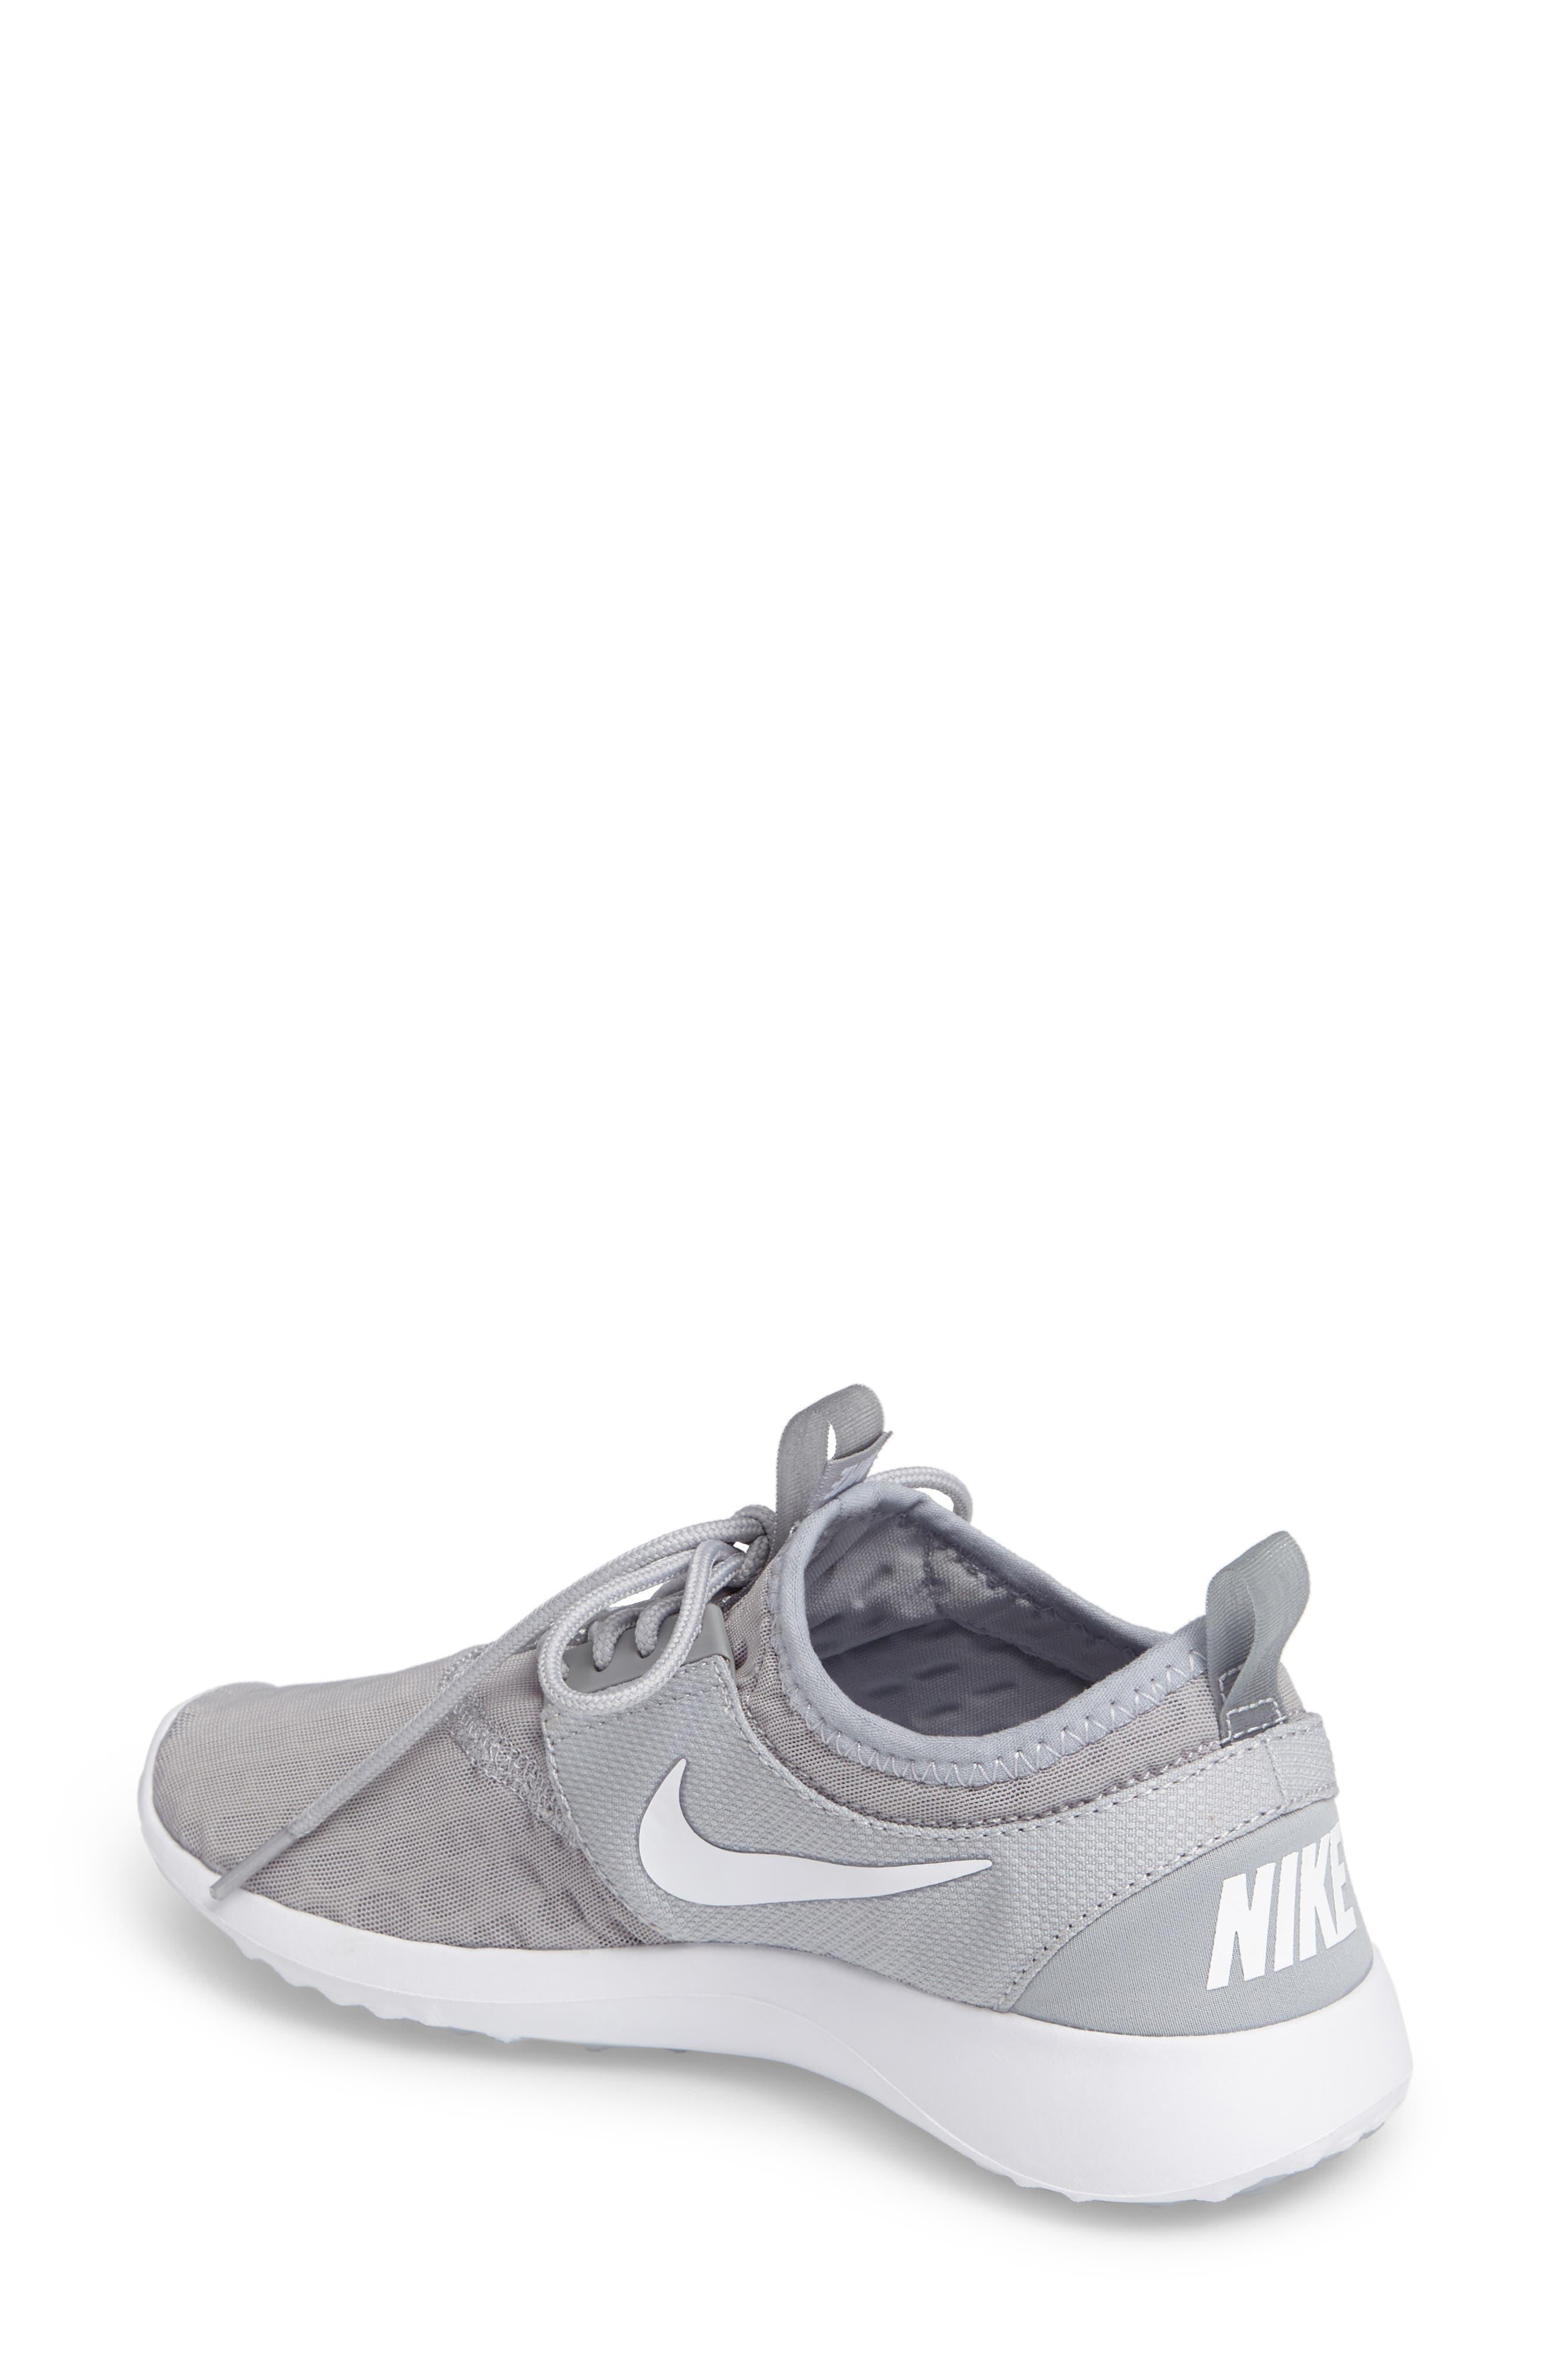 ,                             'Juvenate' Sneaker,                             Alternate thumbnail 73, color,                             025